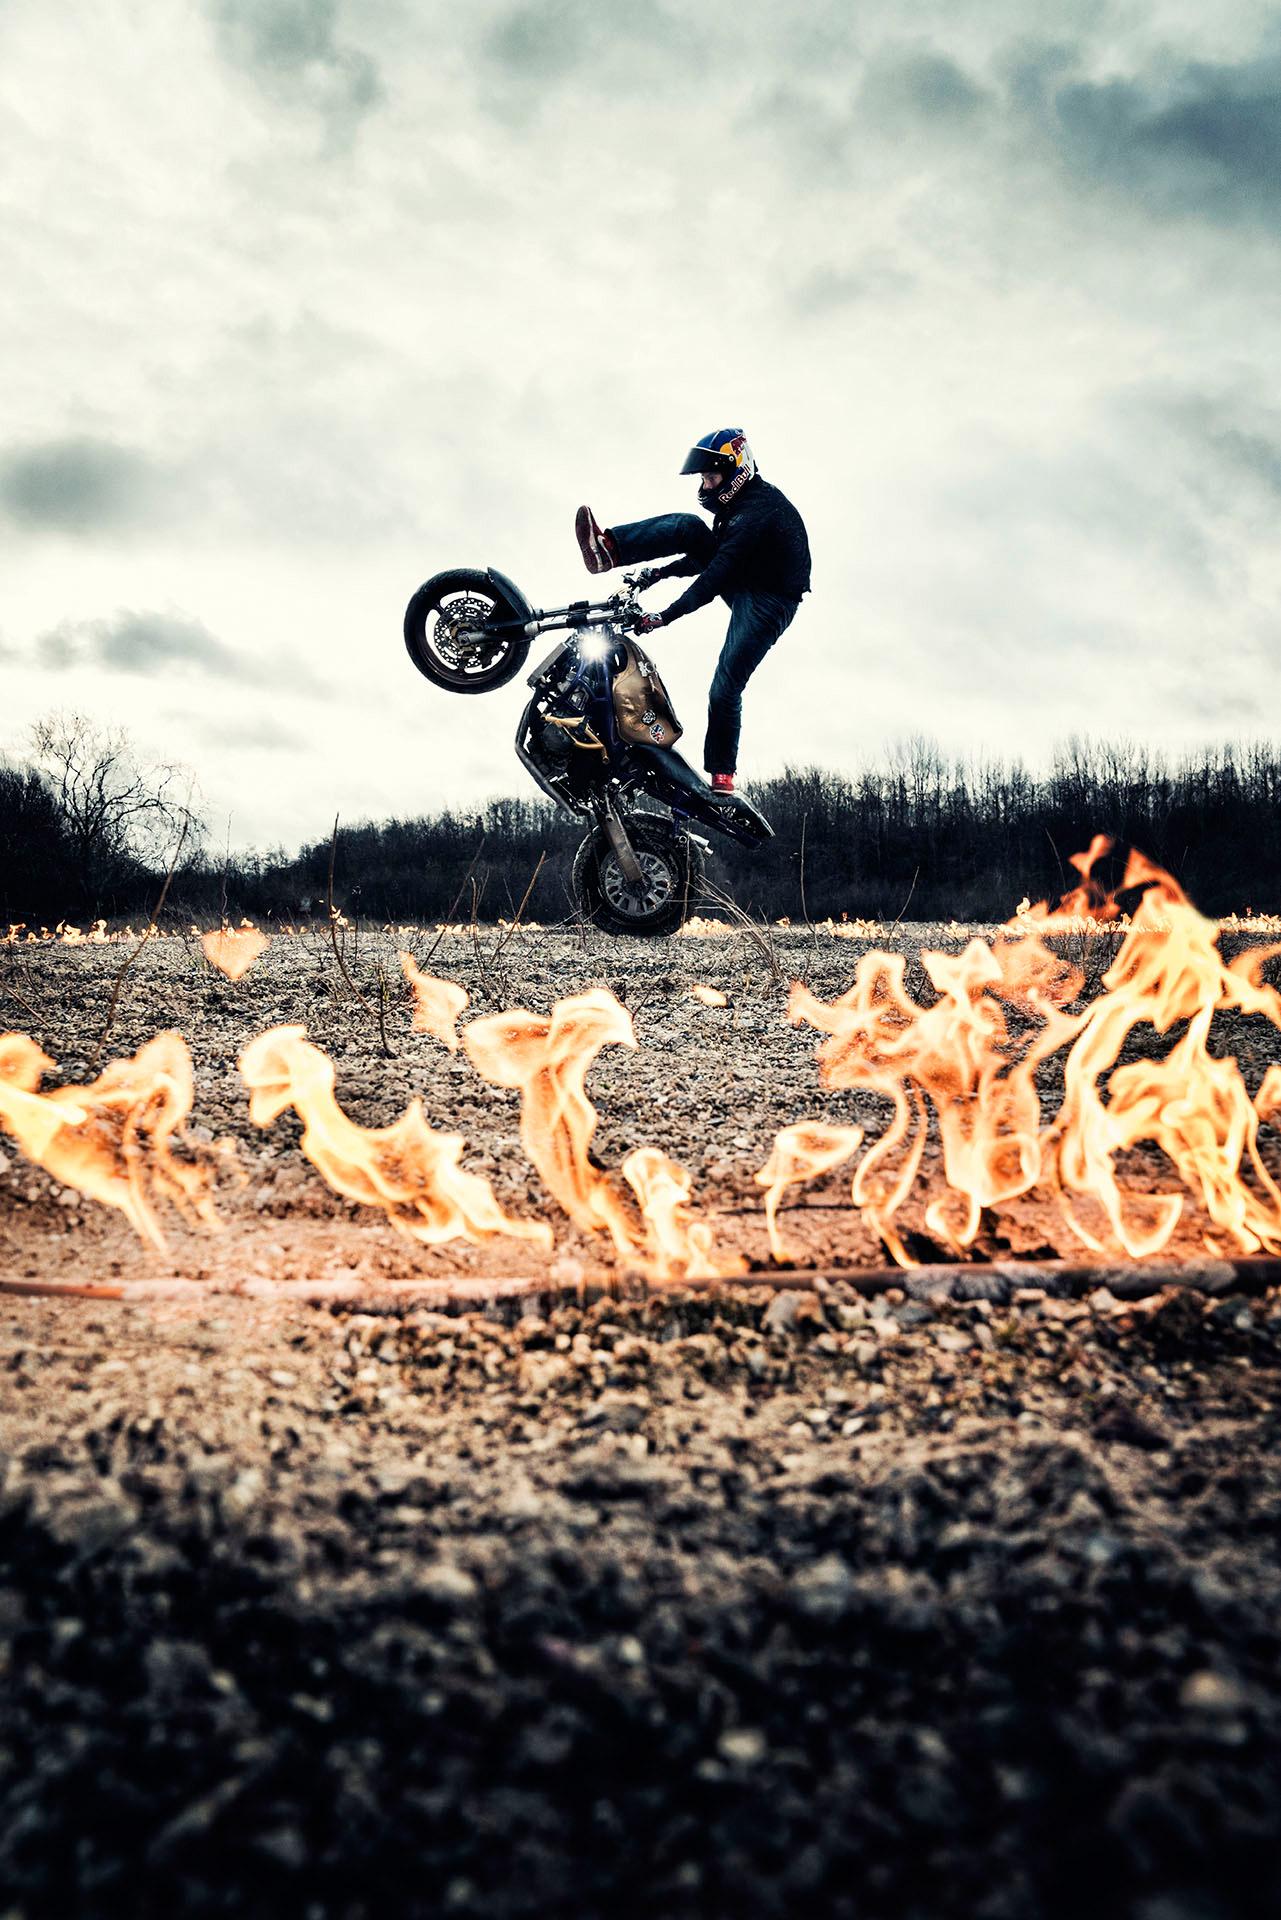 Explosion Actionfotografie Alpha 7 R III